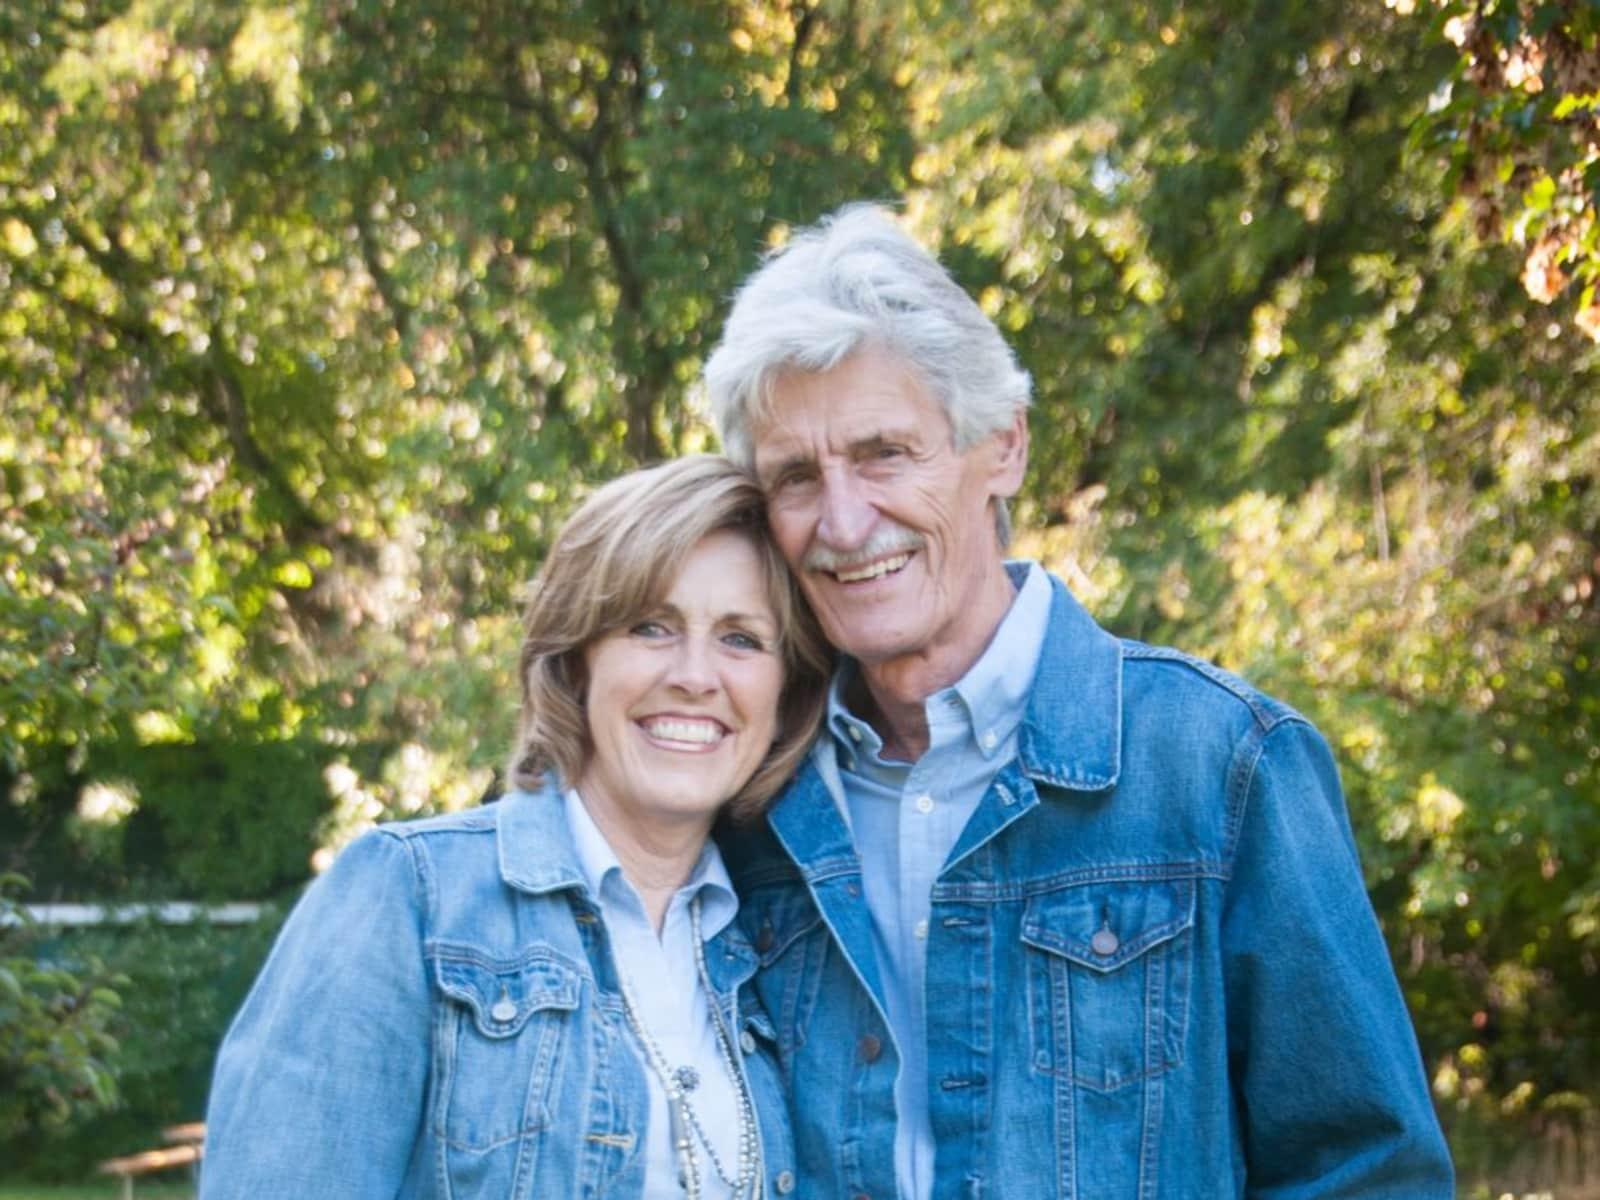 Louanne & Tony from London, Ontario, Canada